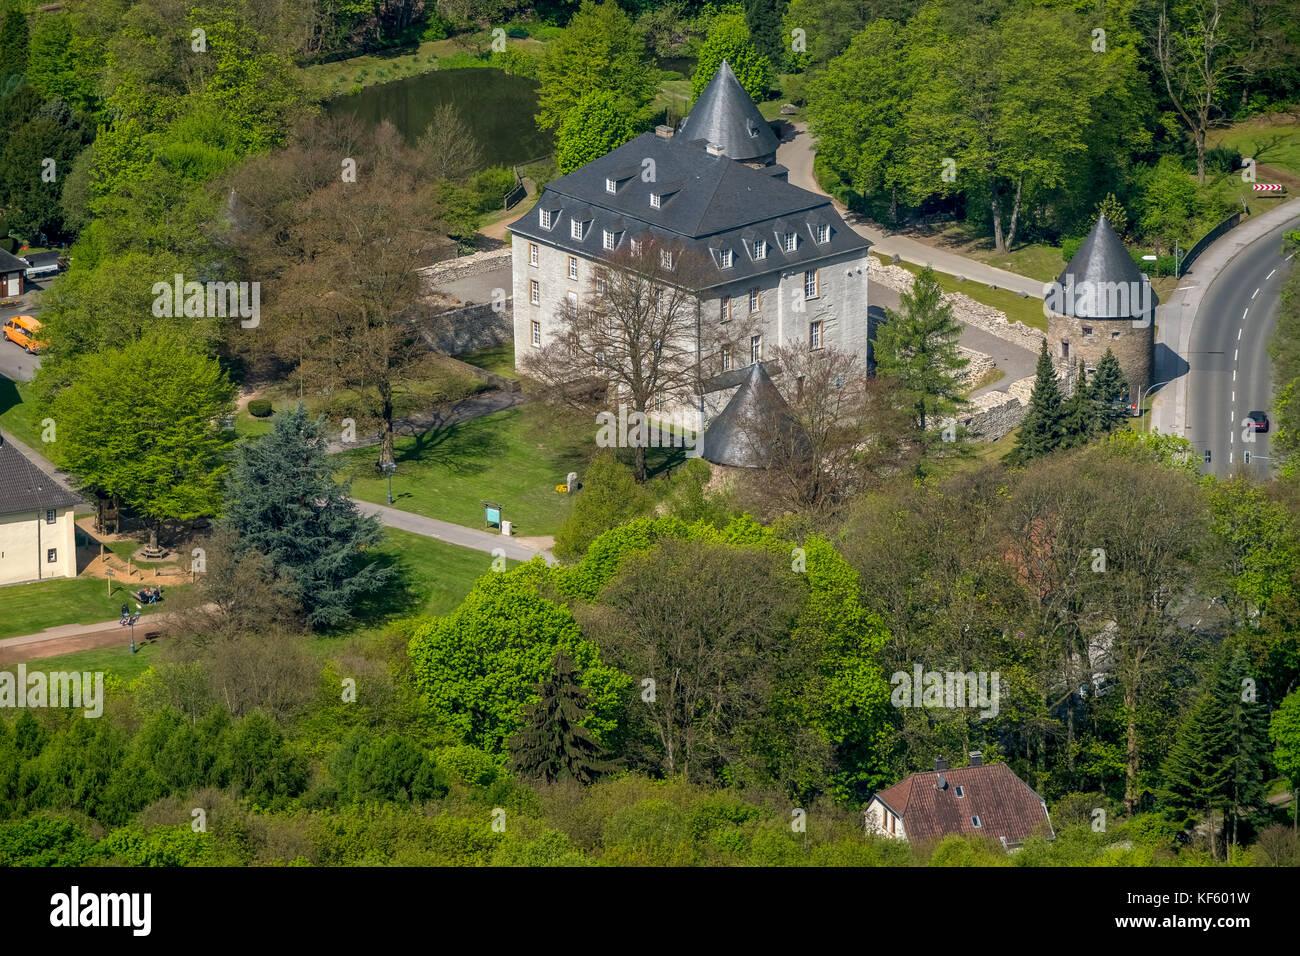 VORBERG CASTLE HARDENBERG, Velbert-Neviges, Velbert, Ruhr area, North Rhine-Westphalia, Germany, Europe, aerial - Stock Image